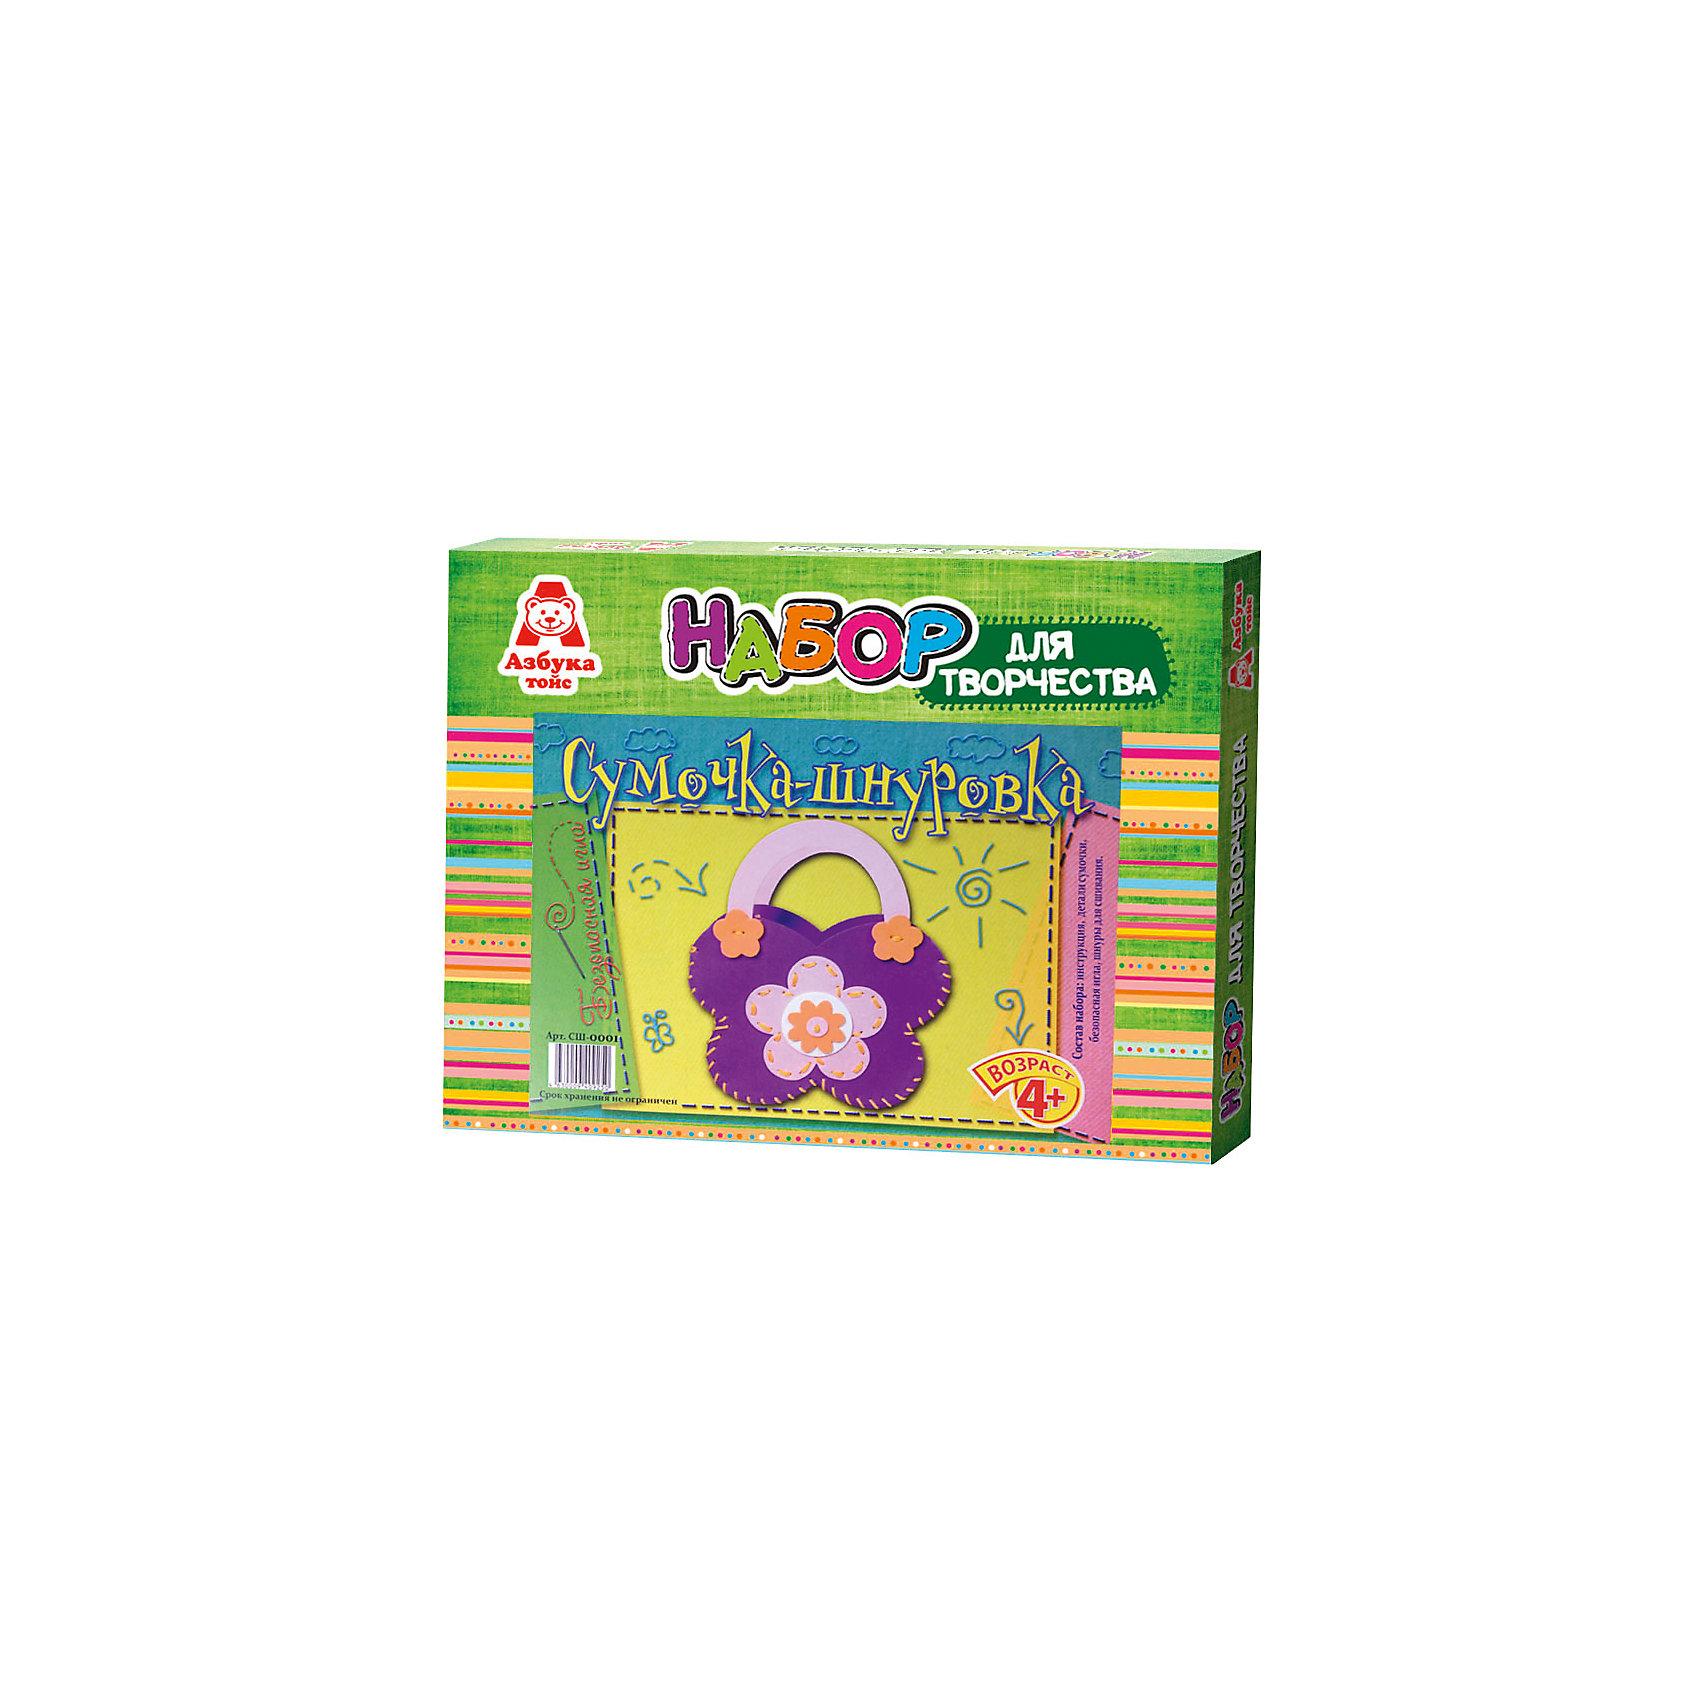 Азбука Тойс Сумочка-шнуровка фиолетовая азбука тойс сумочка из фетра сова белая